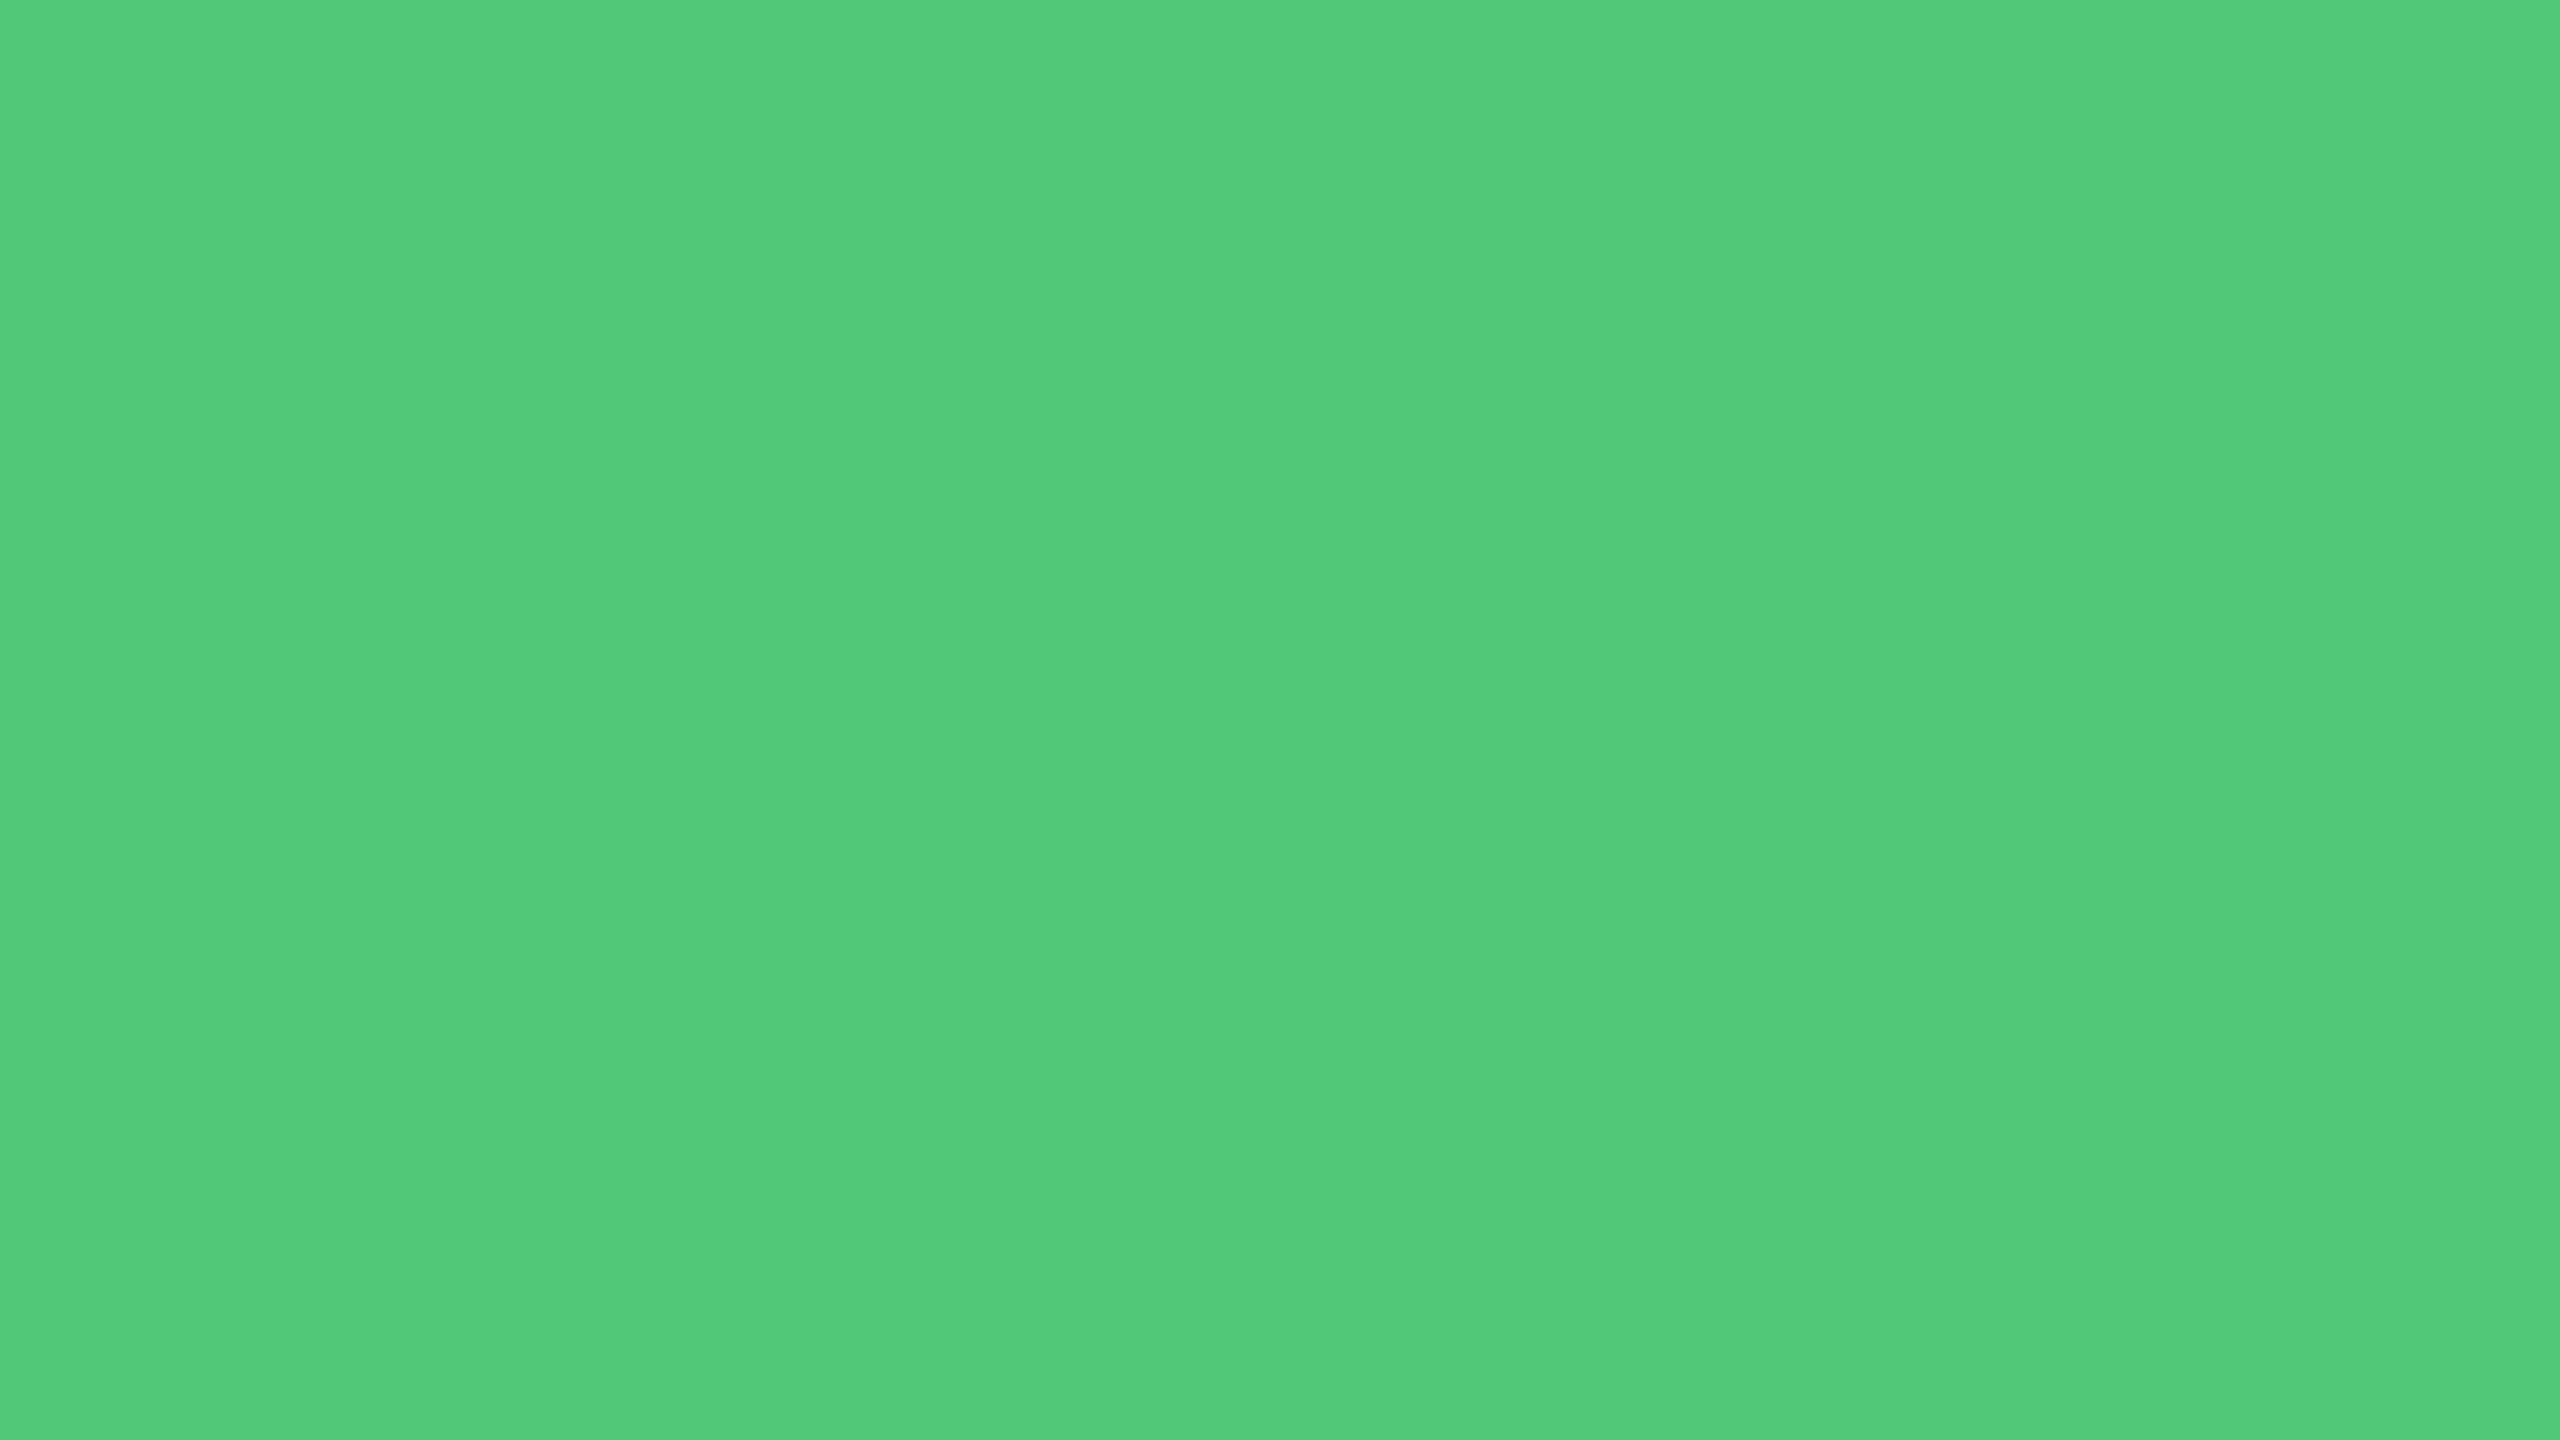 2560x1440 Paris Green Solid Color Background